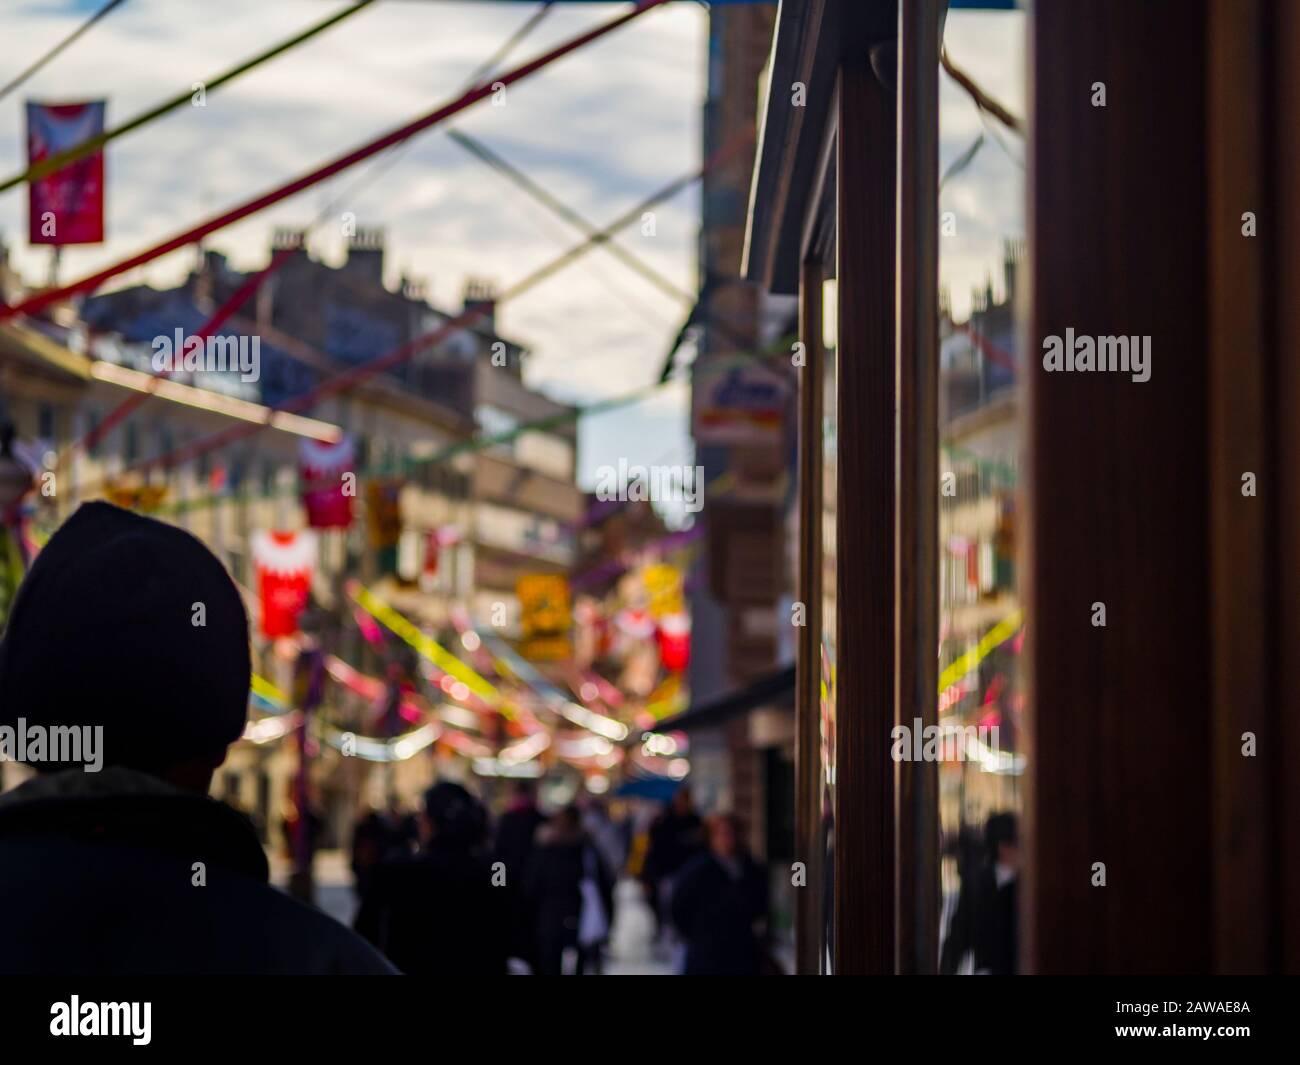 Korzo mailn street in Rijeka Croatia Europe before Carnival Stock Photo